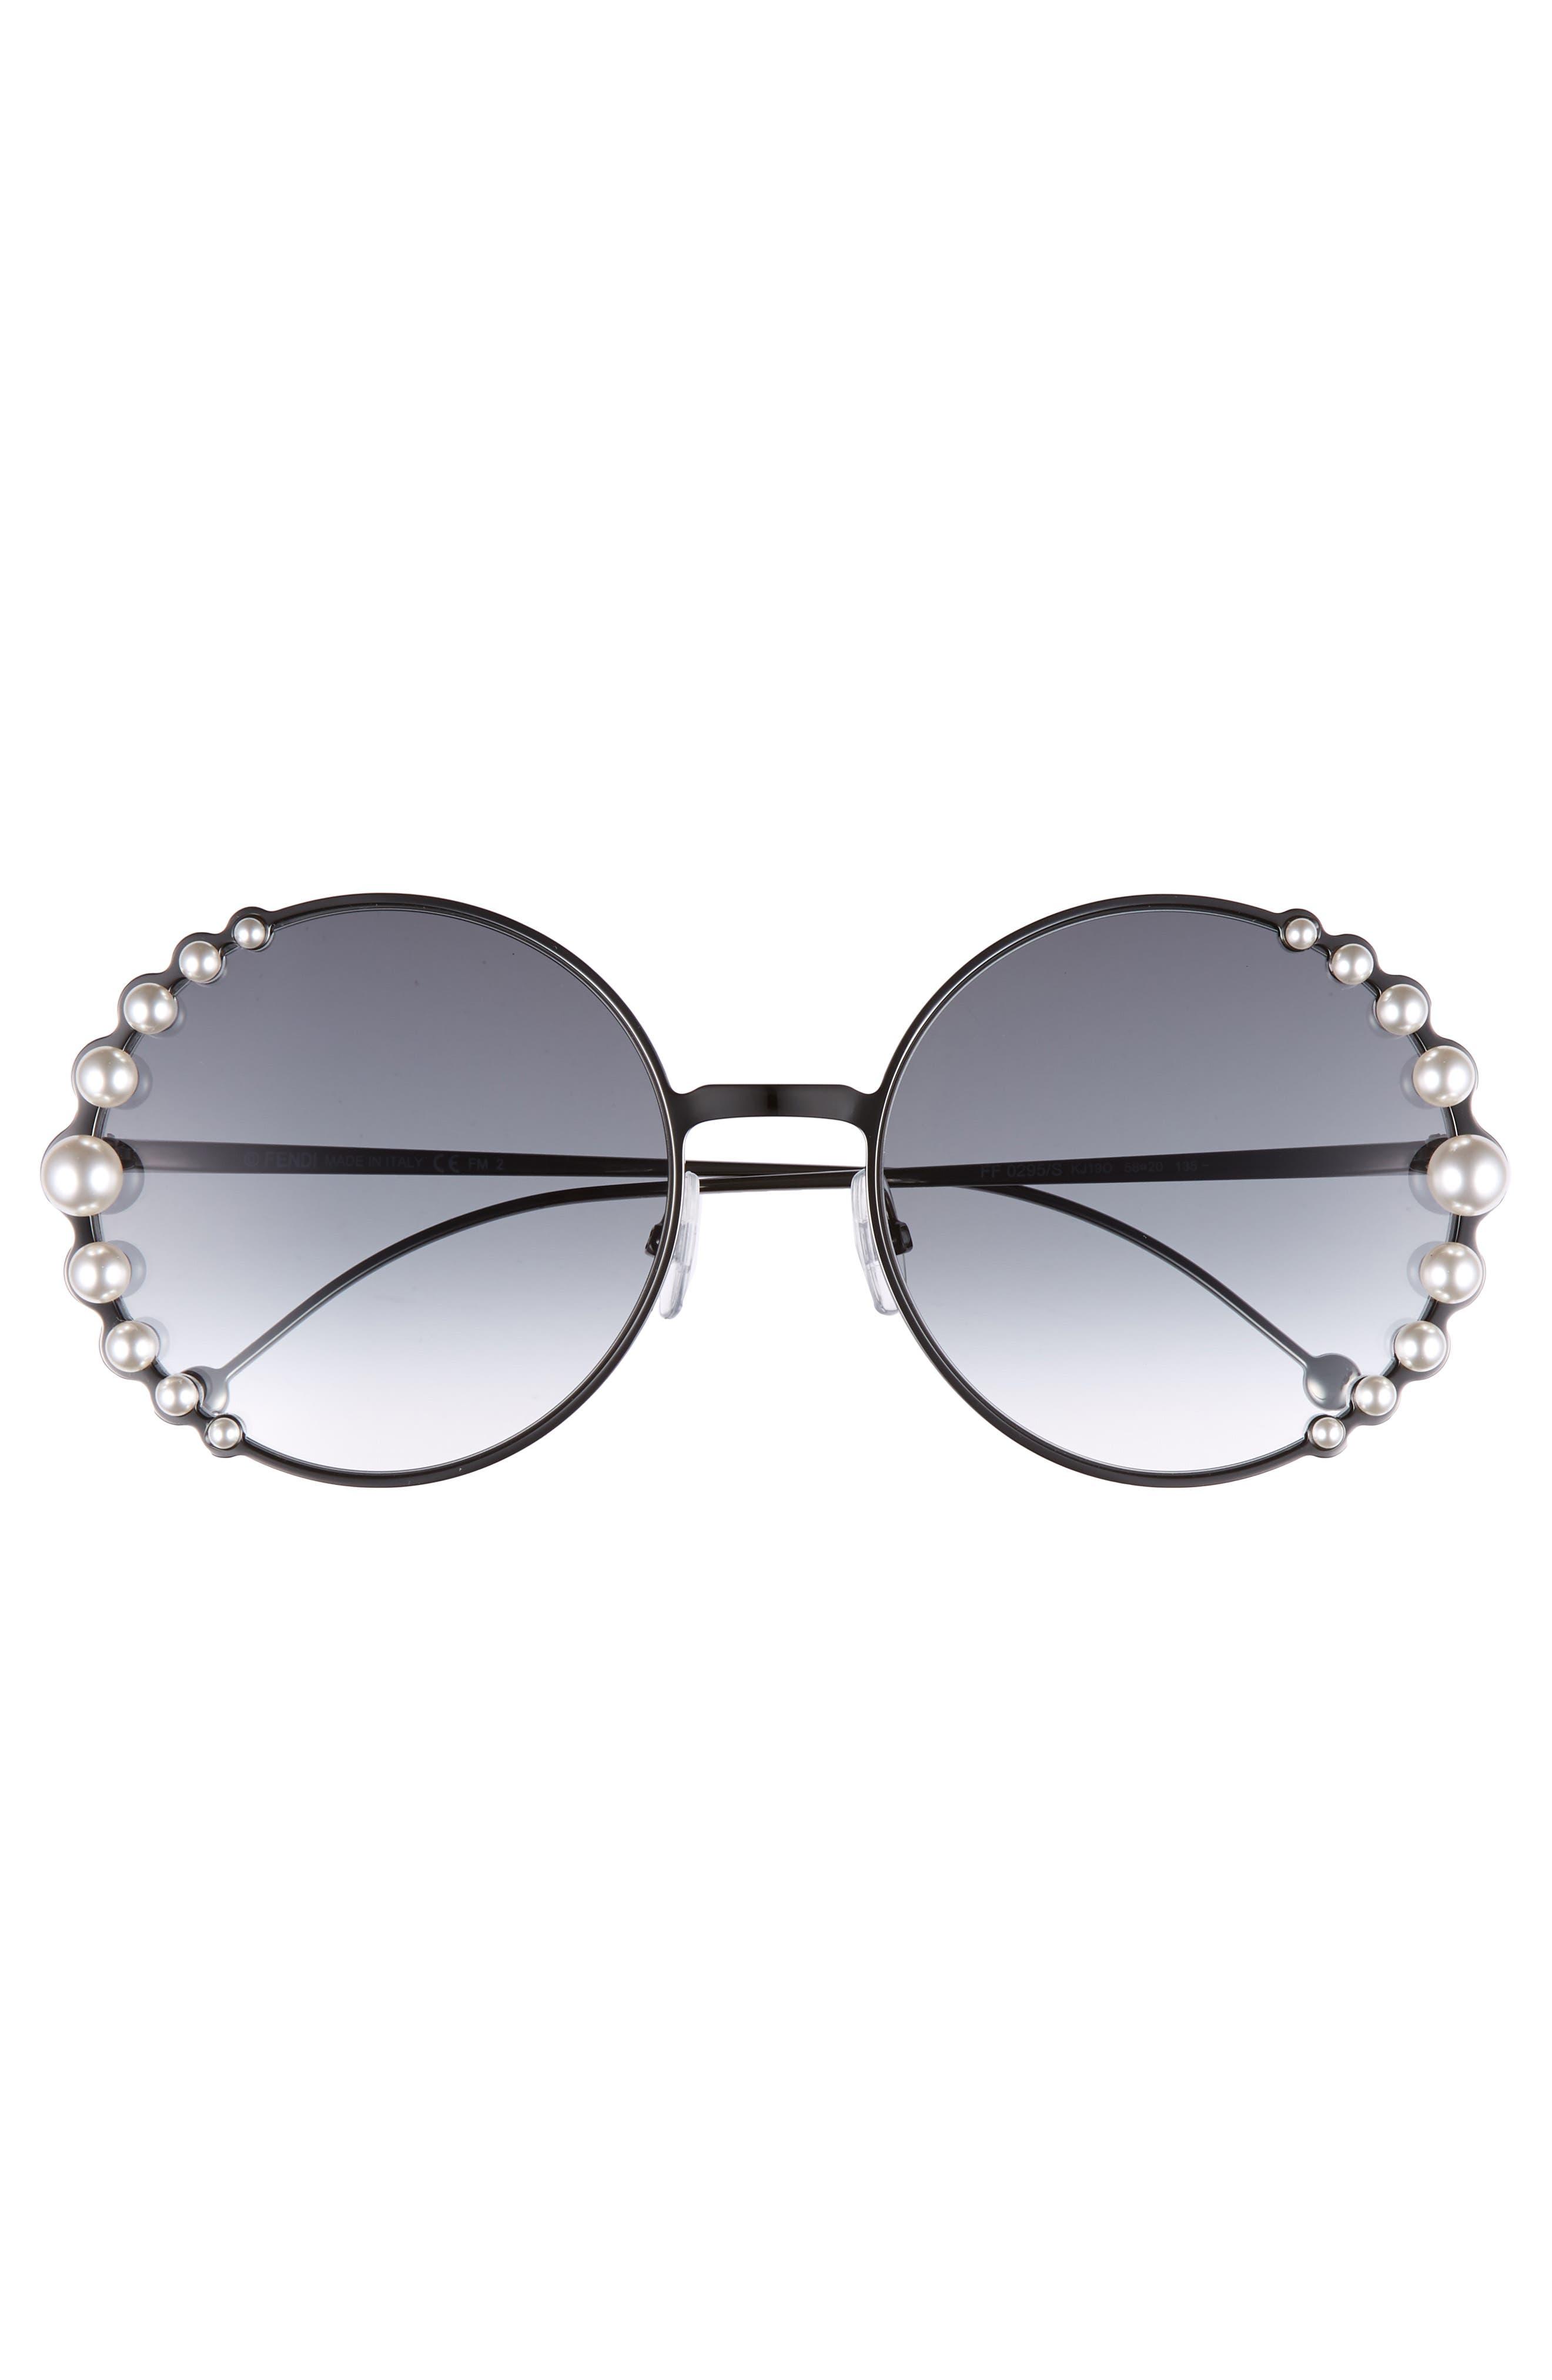 58mm Embellished Round Sunglasses,                             Alternate thumbnail 3, color,                             Dark Ruthenium